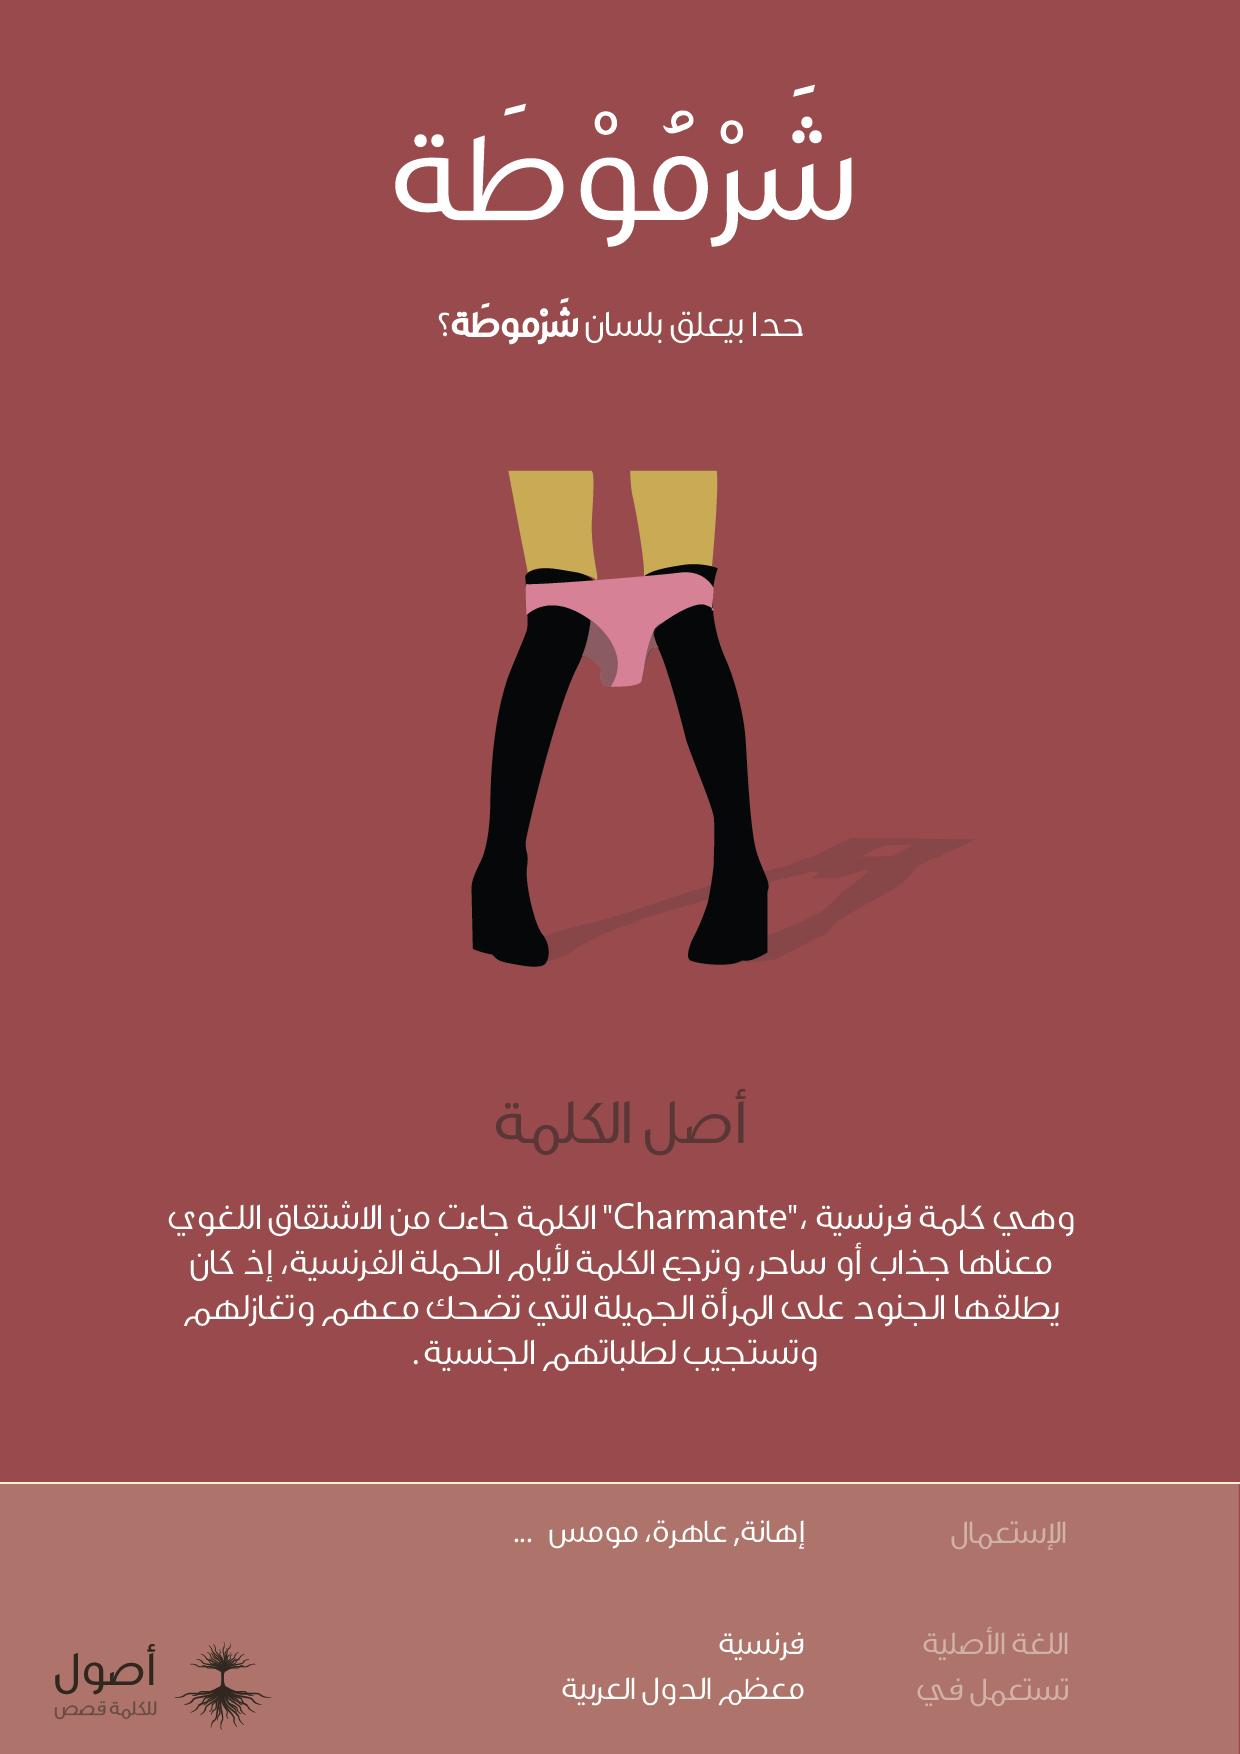 Sharmouta